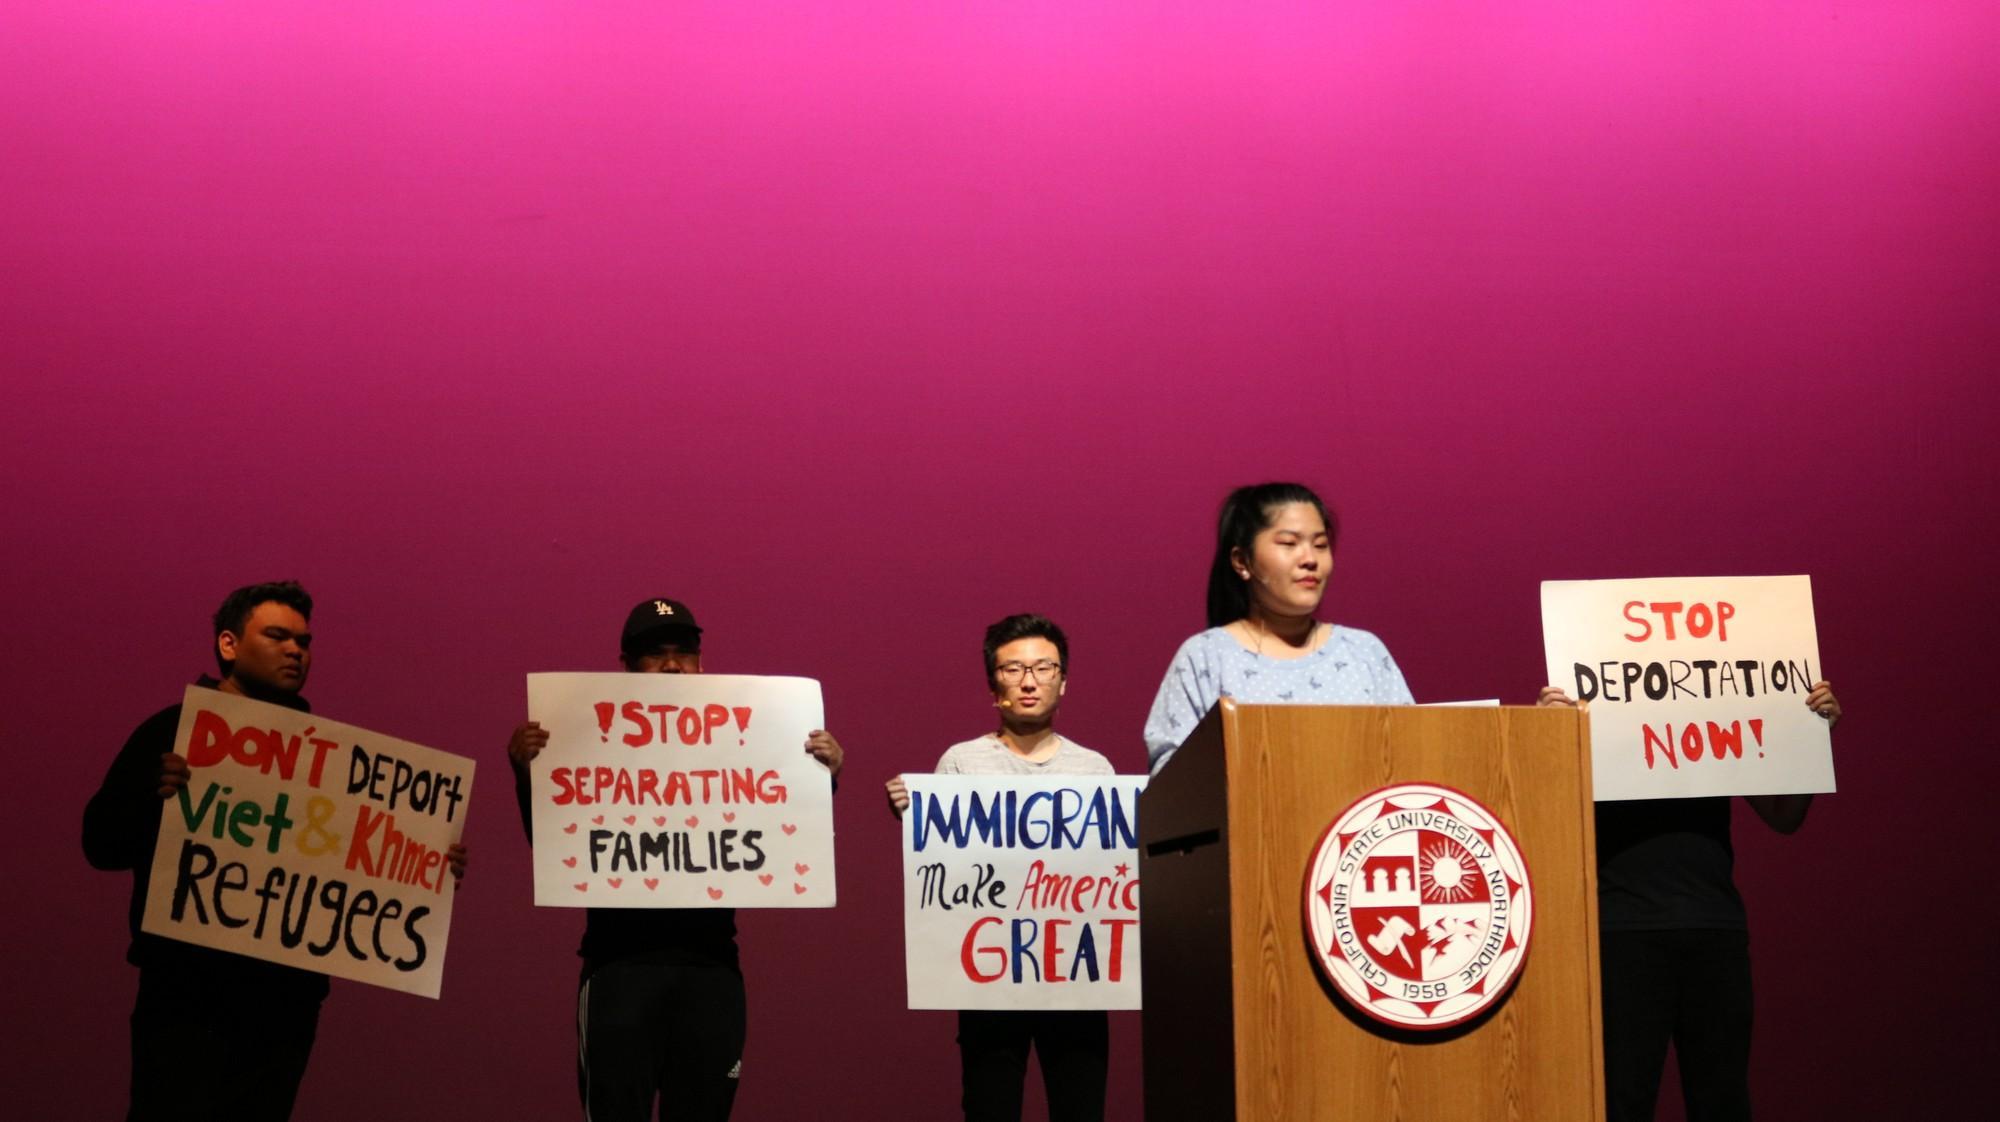 A female student giving speech